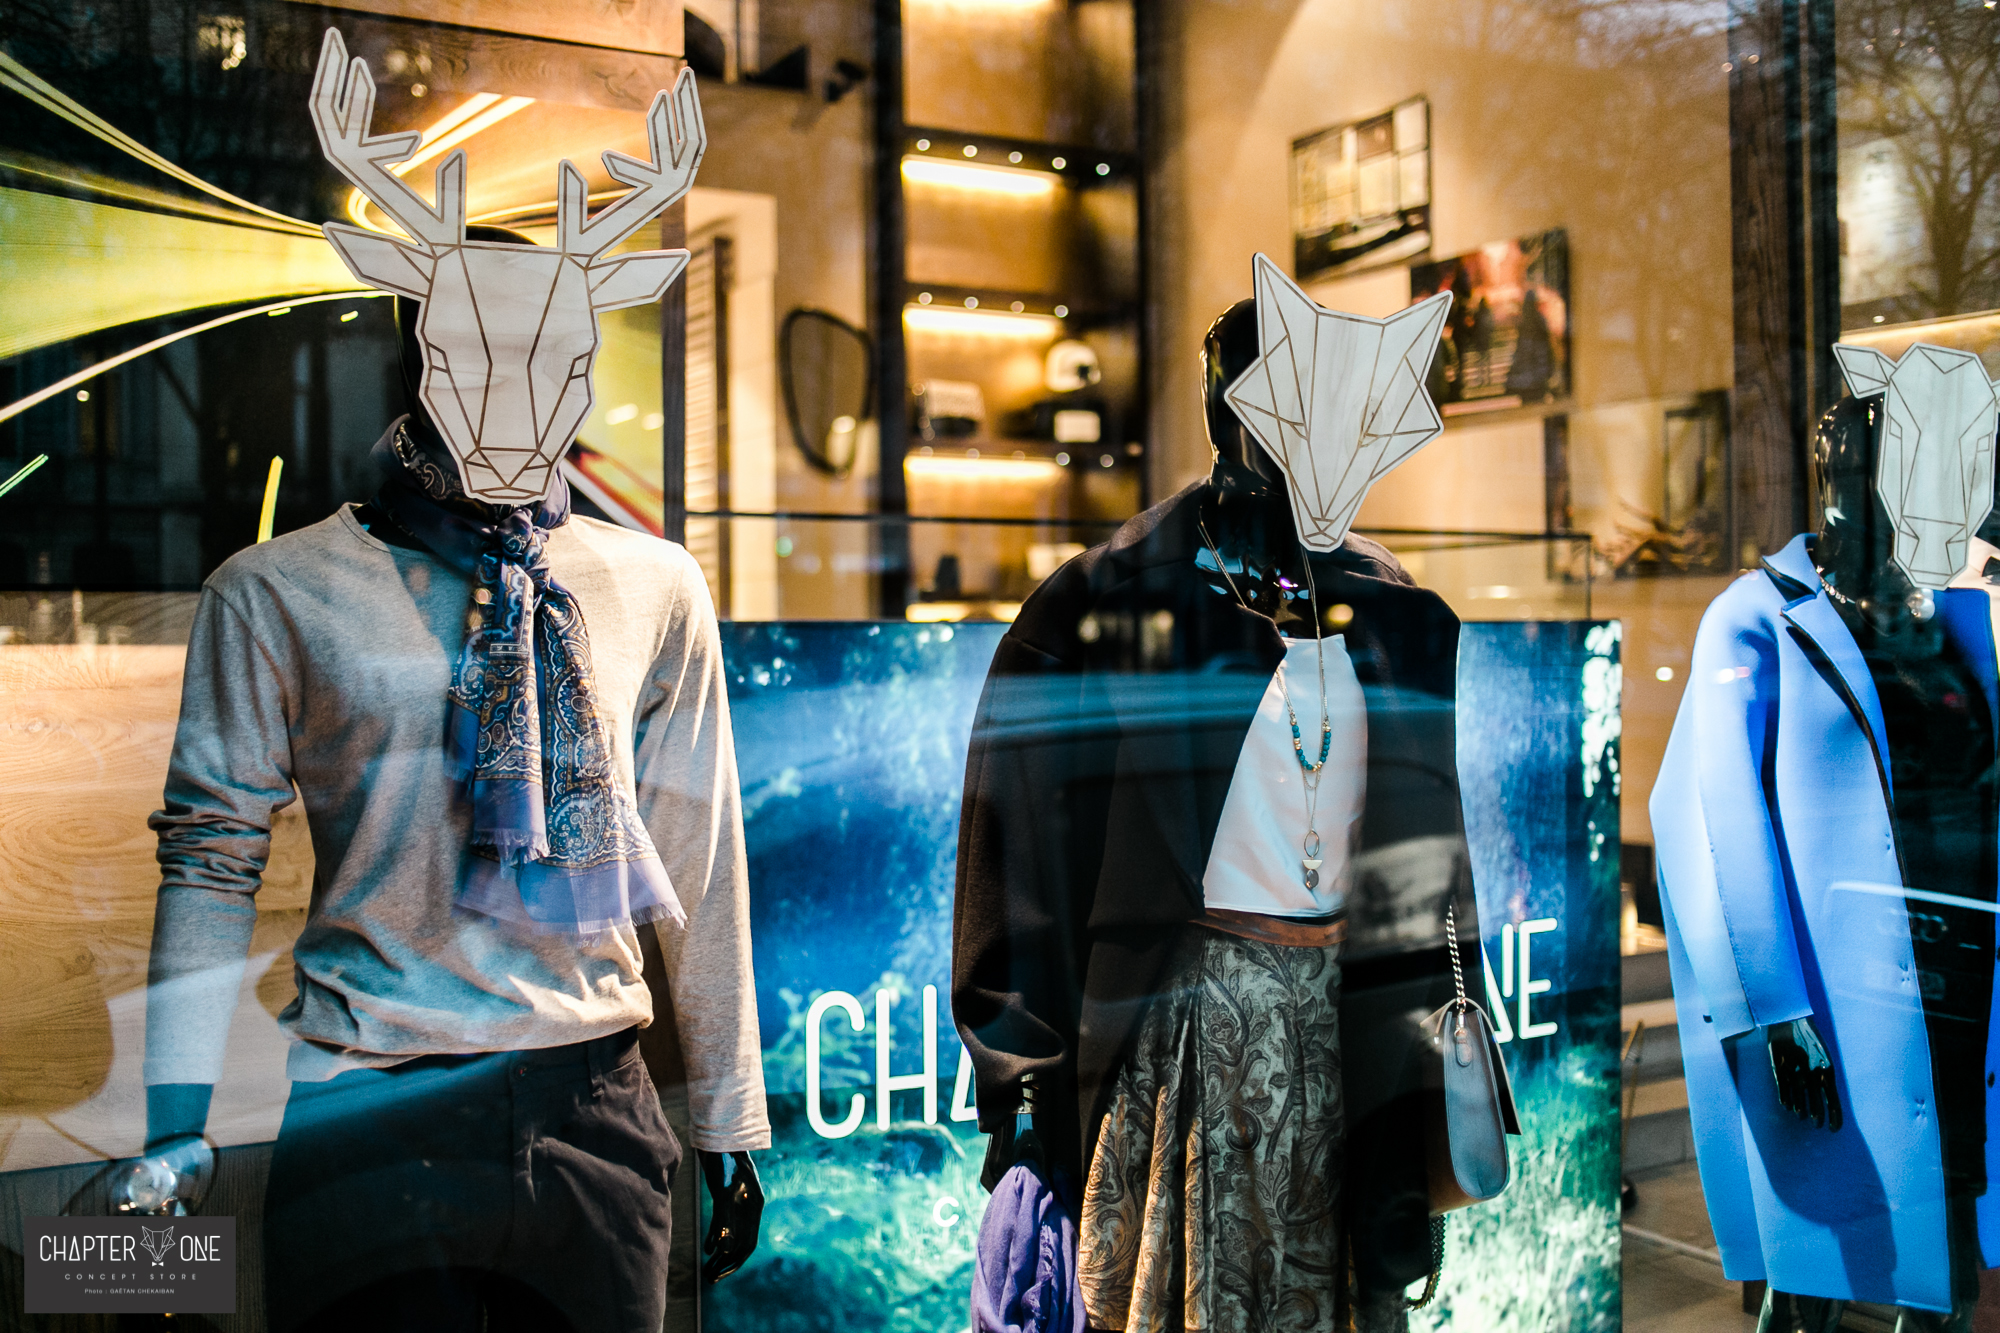 Vlevle-chapter_one-Visual_Identity-store_window-graphic_design-gaelle_de_laveleye